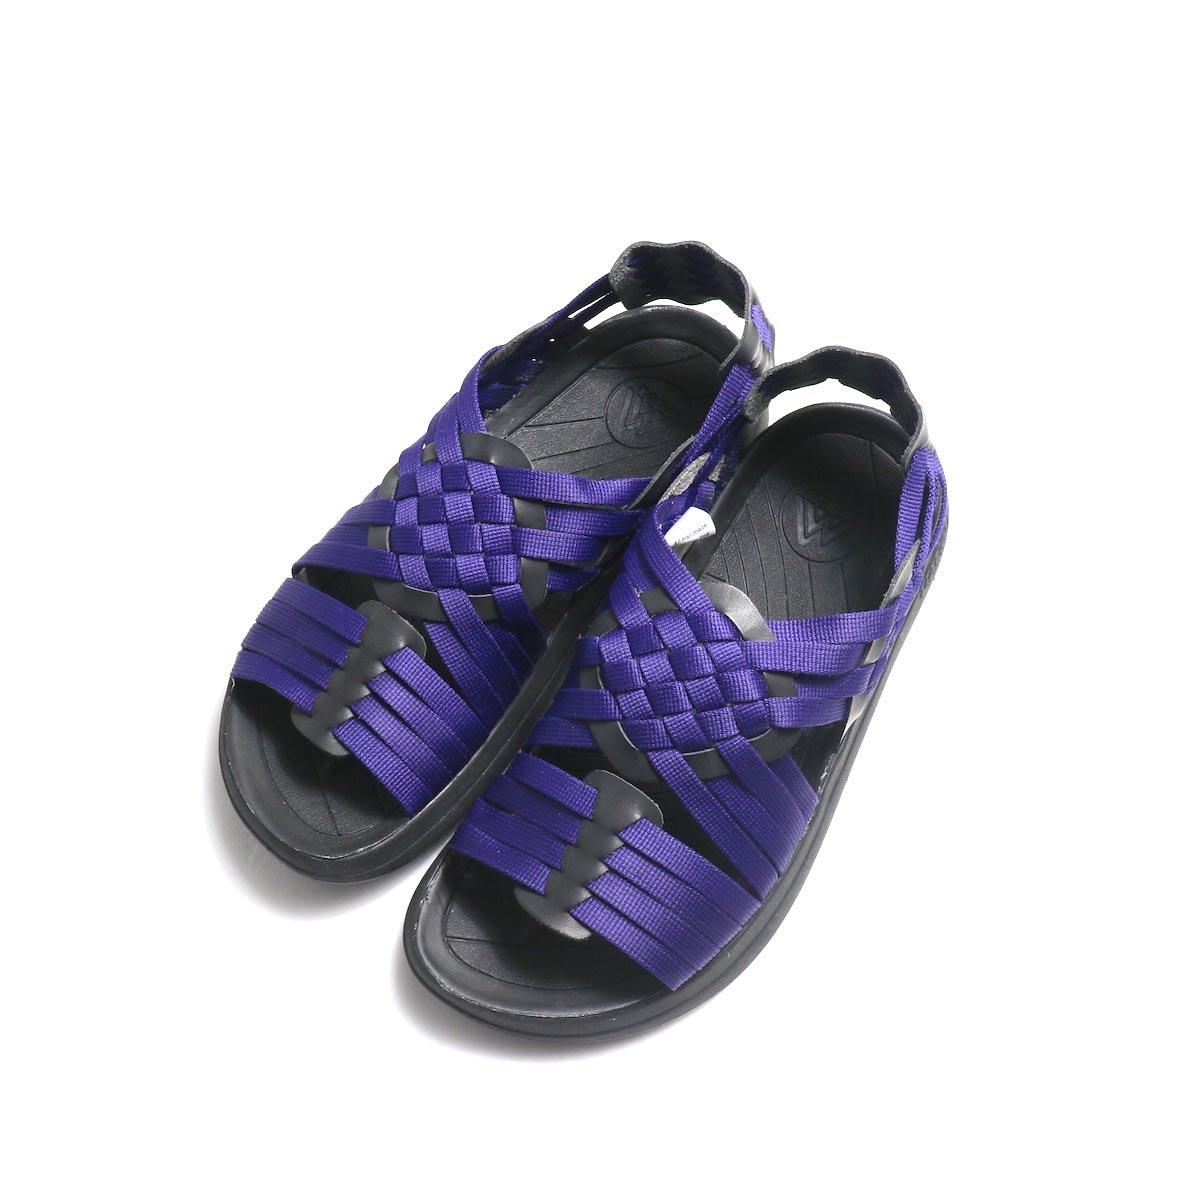 Malibu Sandals / Canyon (Nylon Weave) -Purple